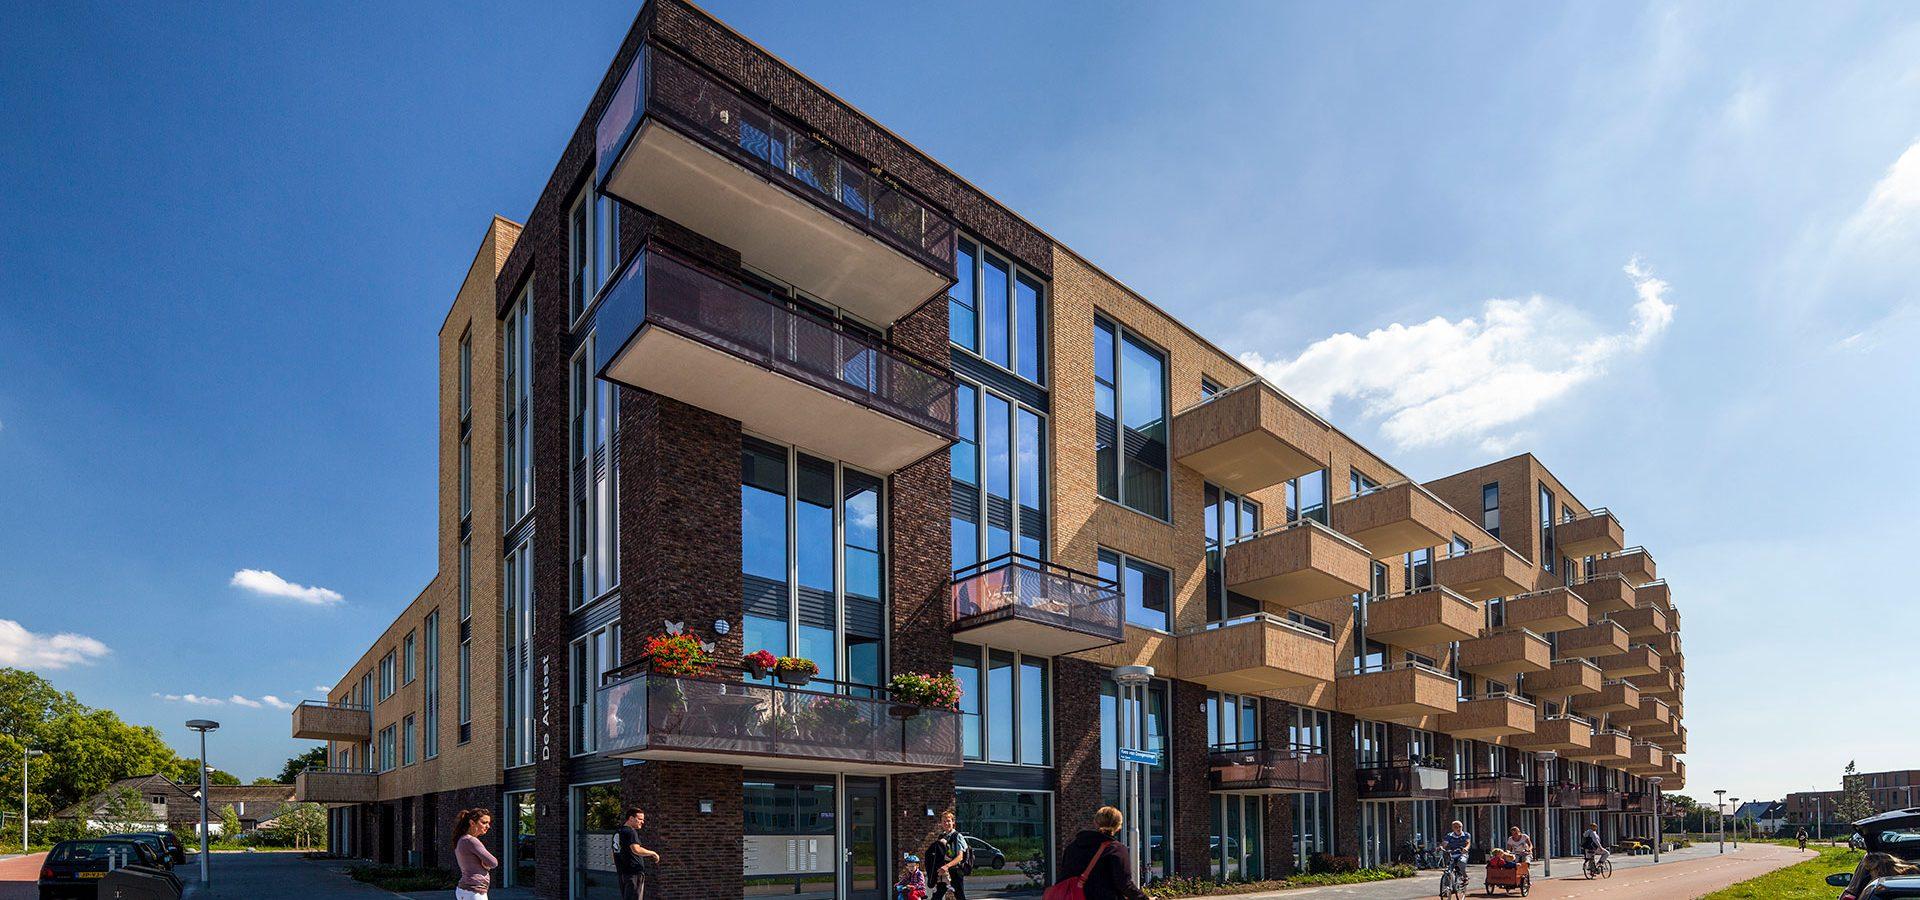 FARO architecten 't Zand Leidsche Rijn Utrecht 02